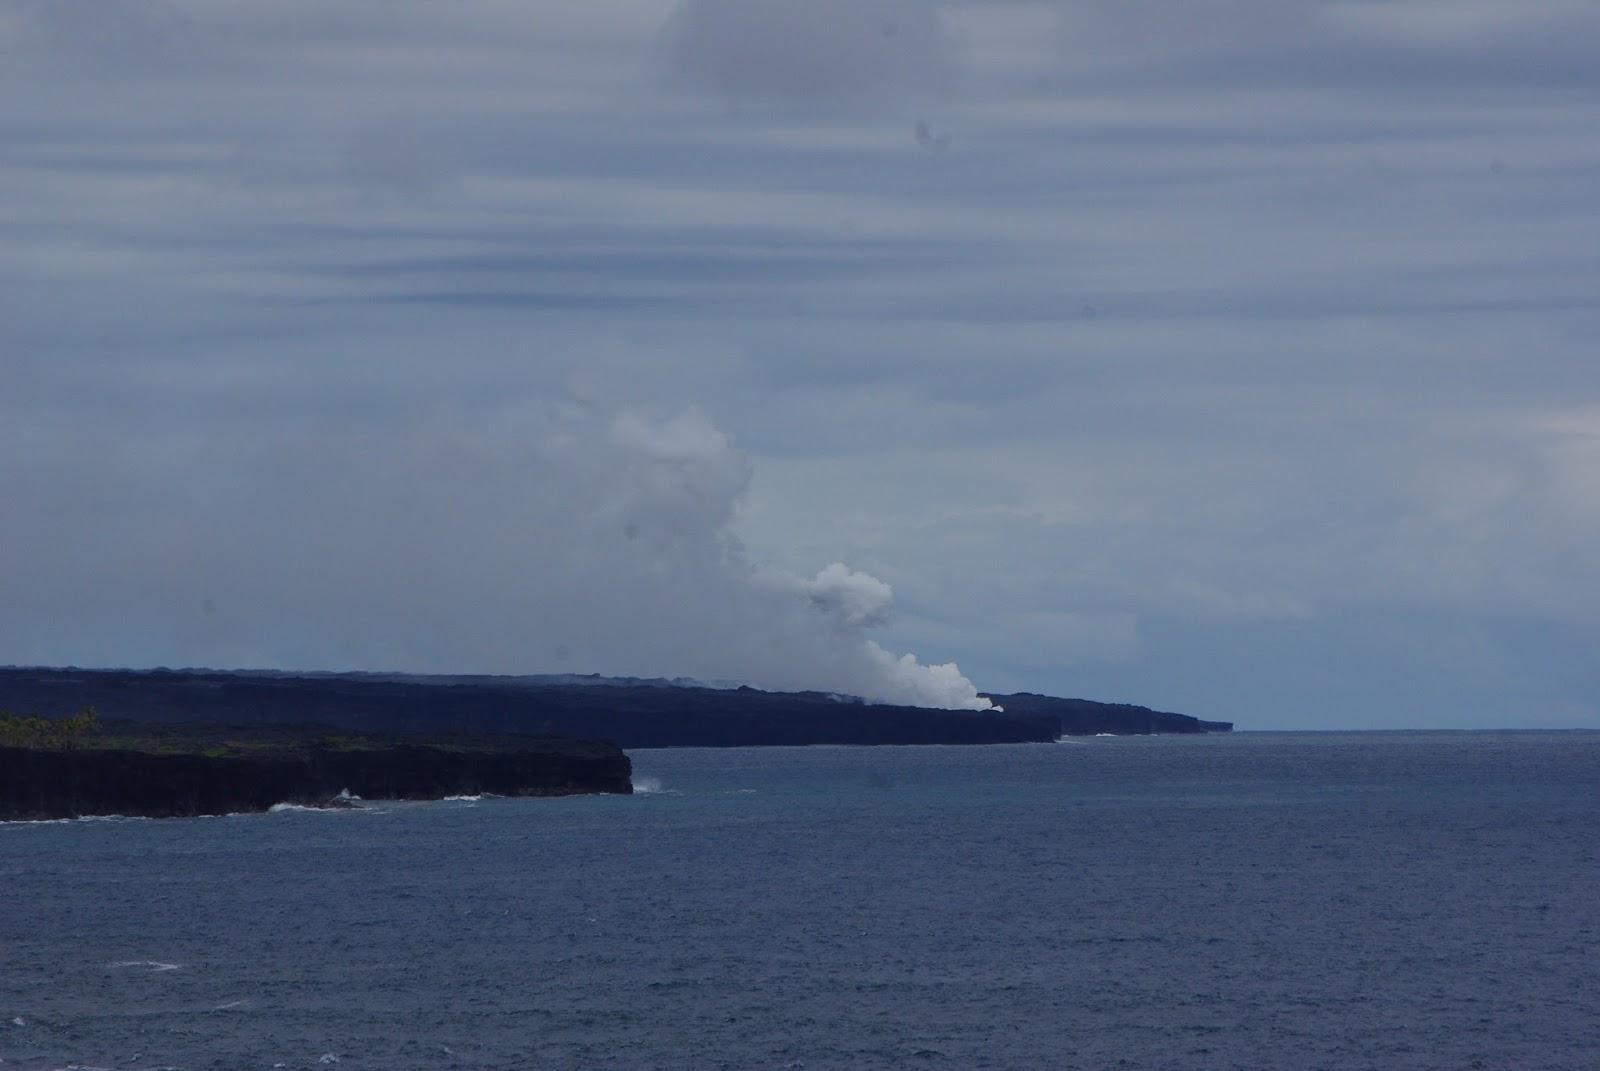 bigisland 溶岩流のオーシャンエントリー ocean entry of lava flow